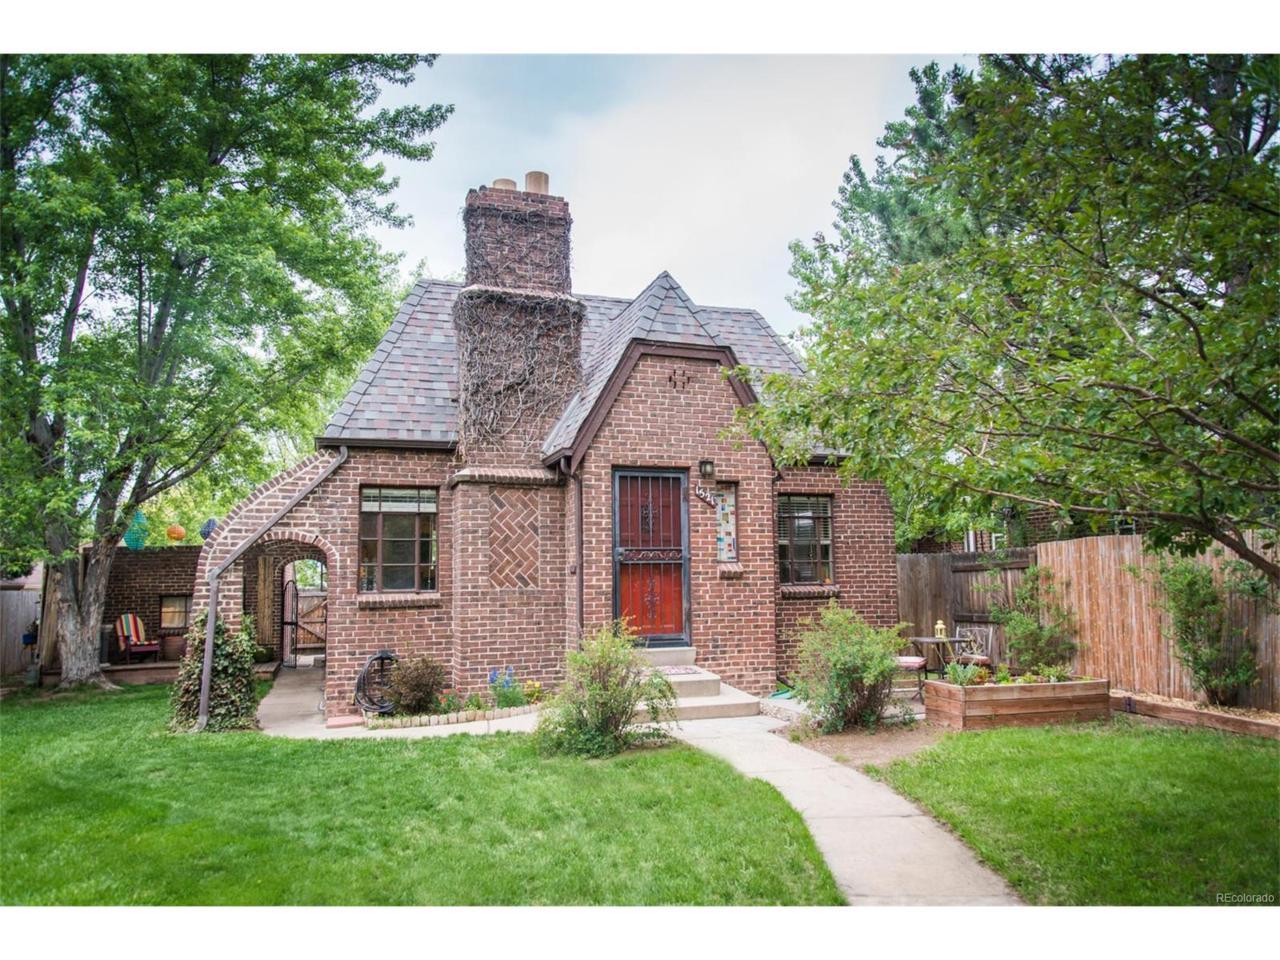 1521 S University Boulevard, Denver, CO 80210 (MLS #1501653) :: 8z Real Estate